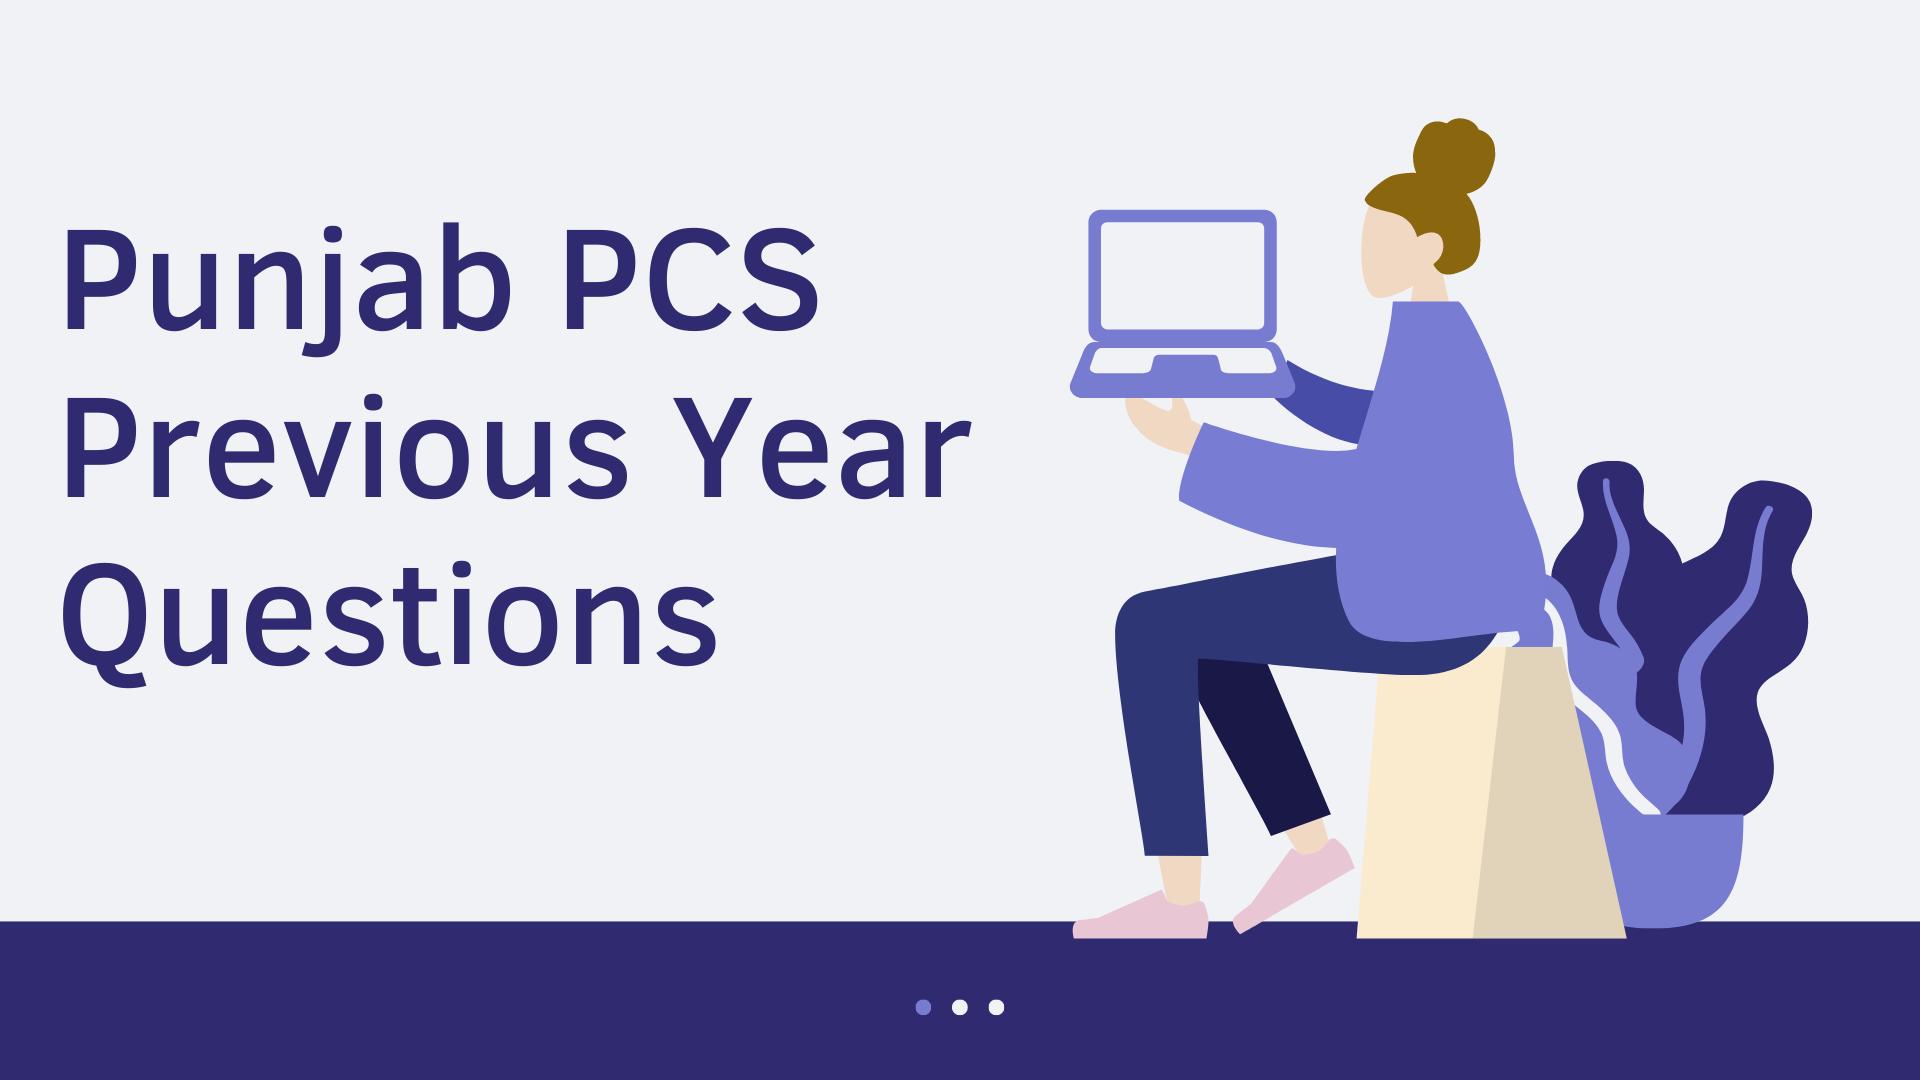 Punjab PCS 2021 Previous Year questions: Part 4